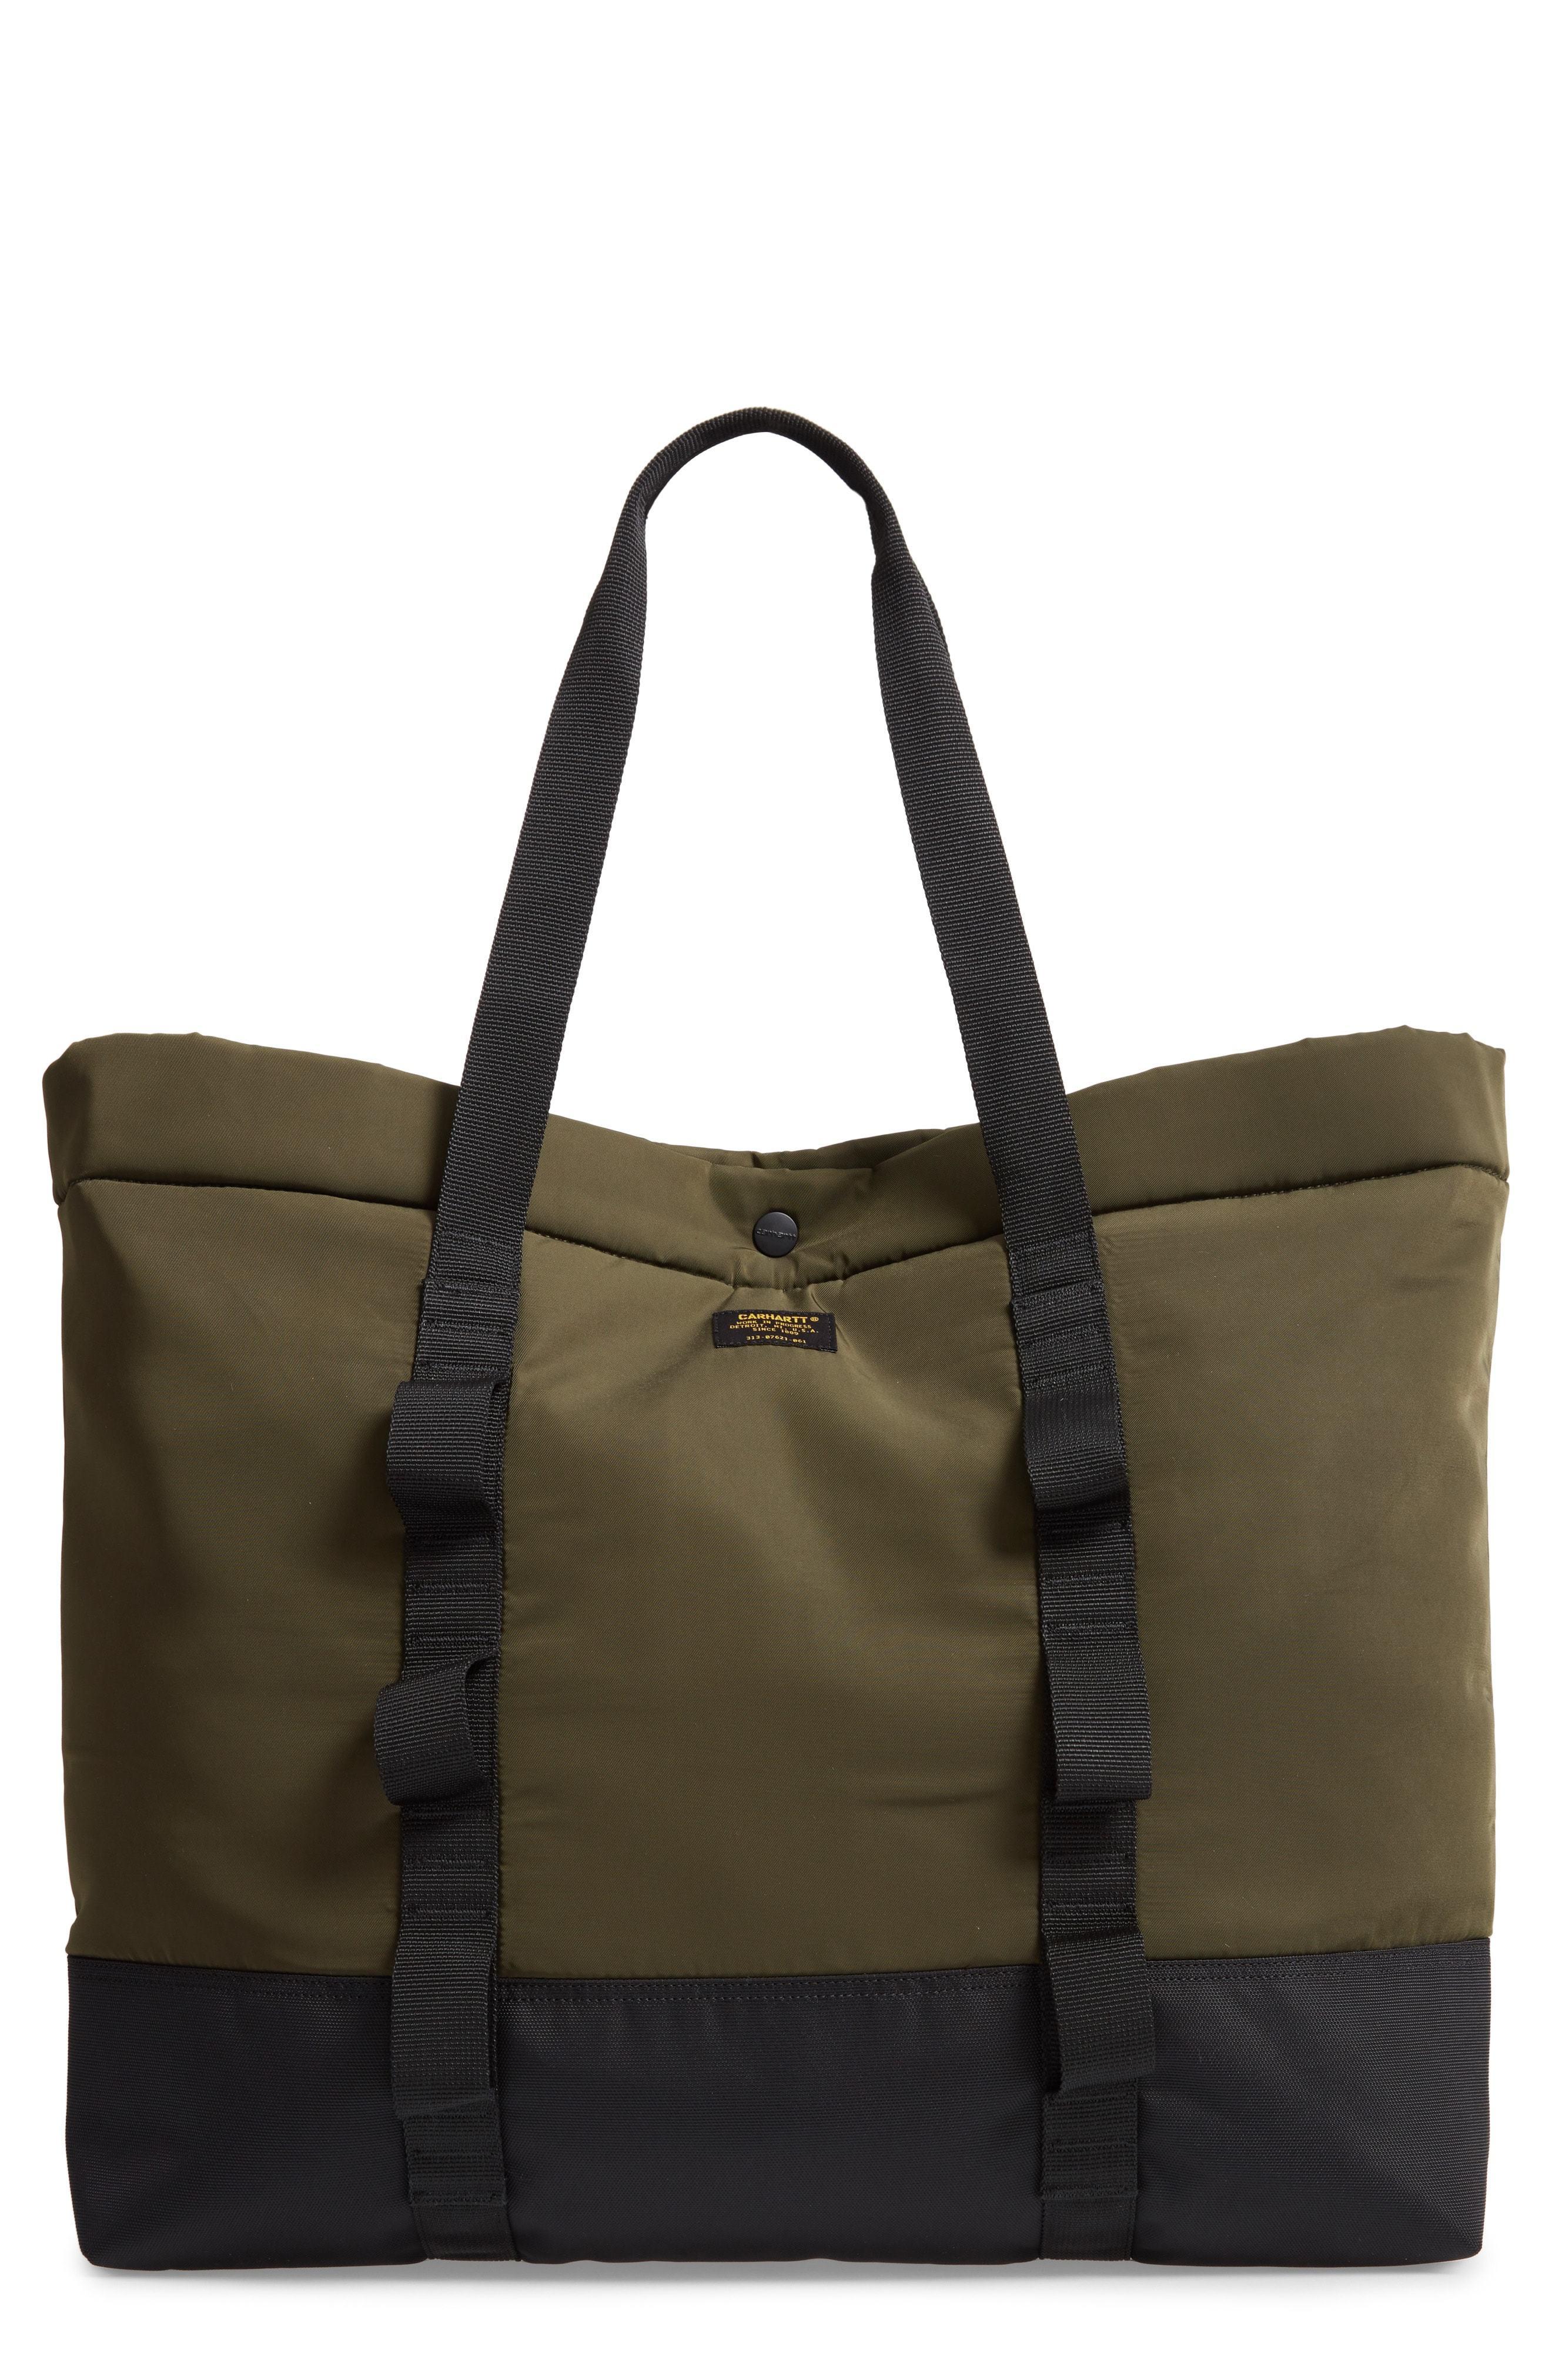 a1d87035632 CARHARTT WORK IN PROGRESS Military Shopper Tote Bag, $108 ...